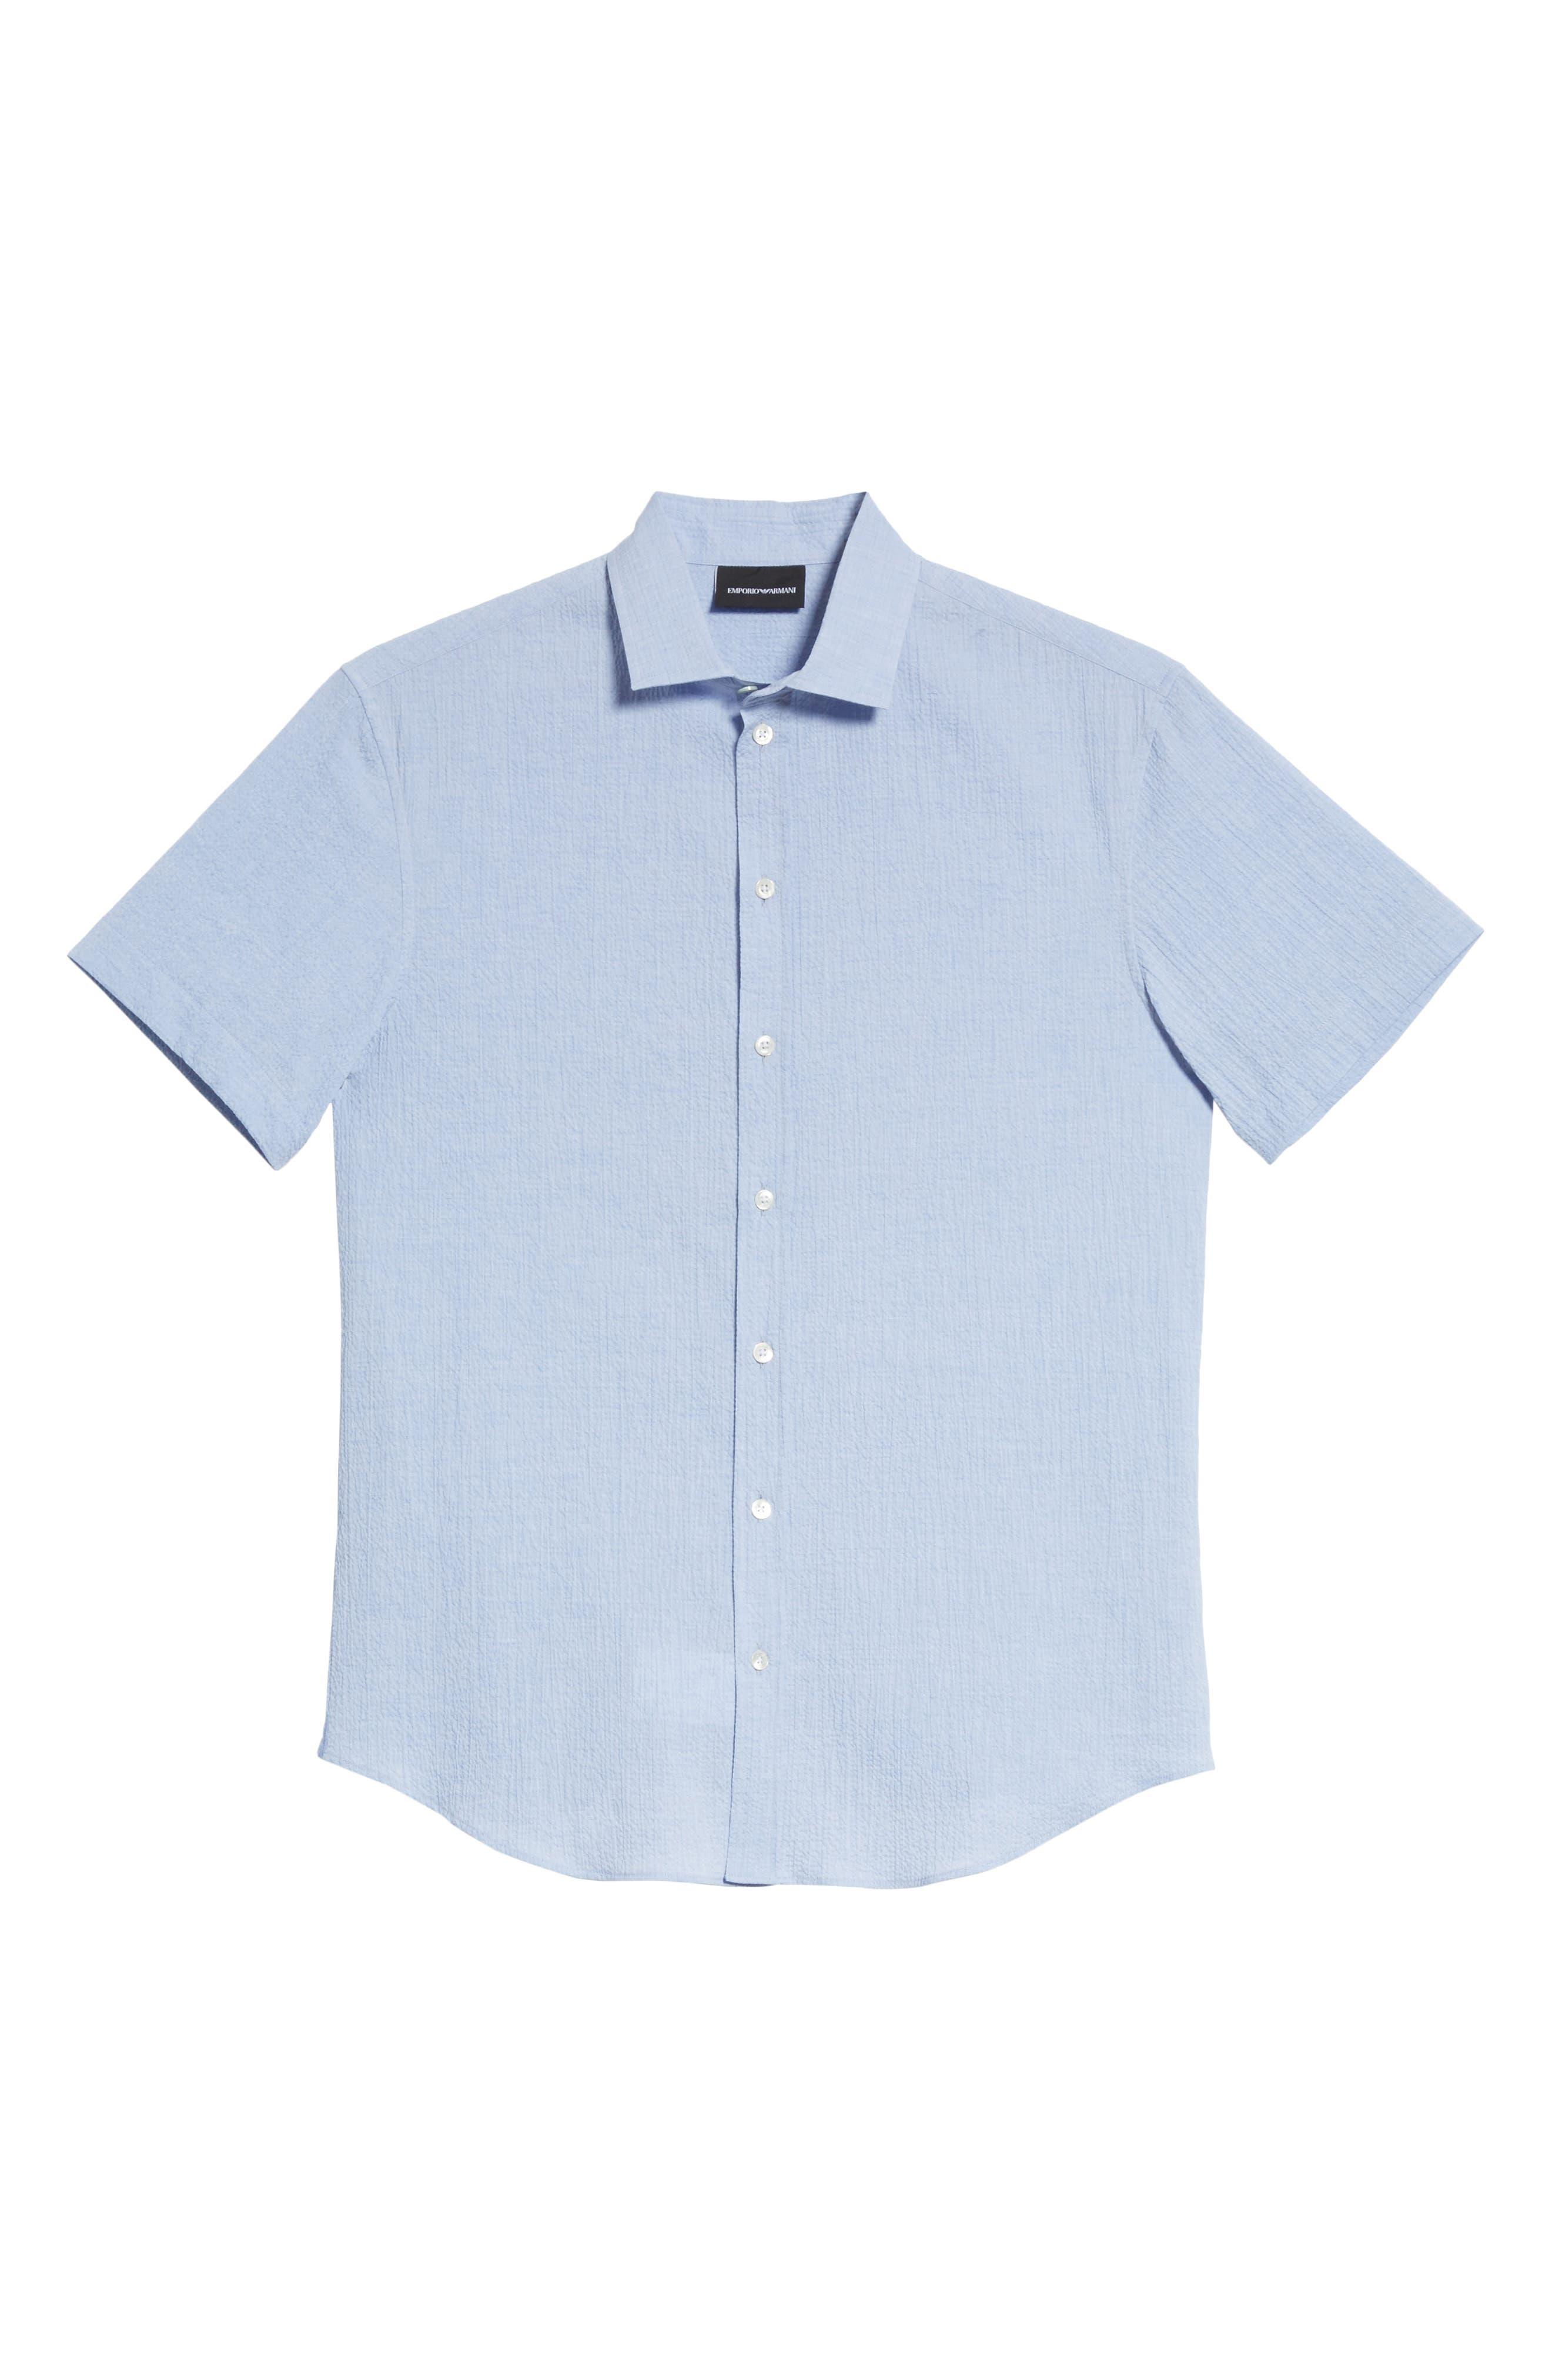 Regular Fit Seersucker Sport Shirt,                             Alternate thumbnail 6, color,                             Light Azure